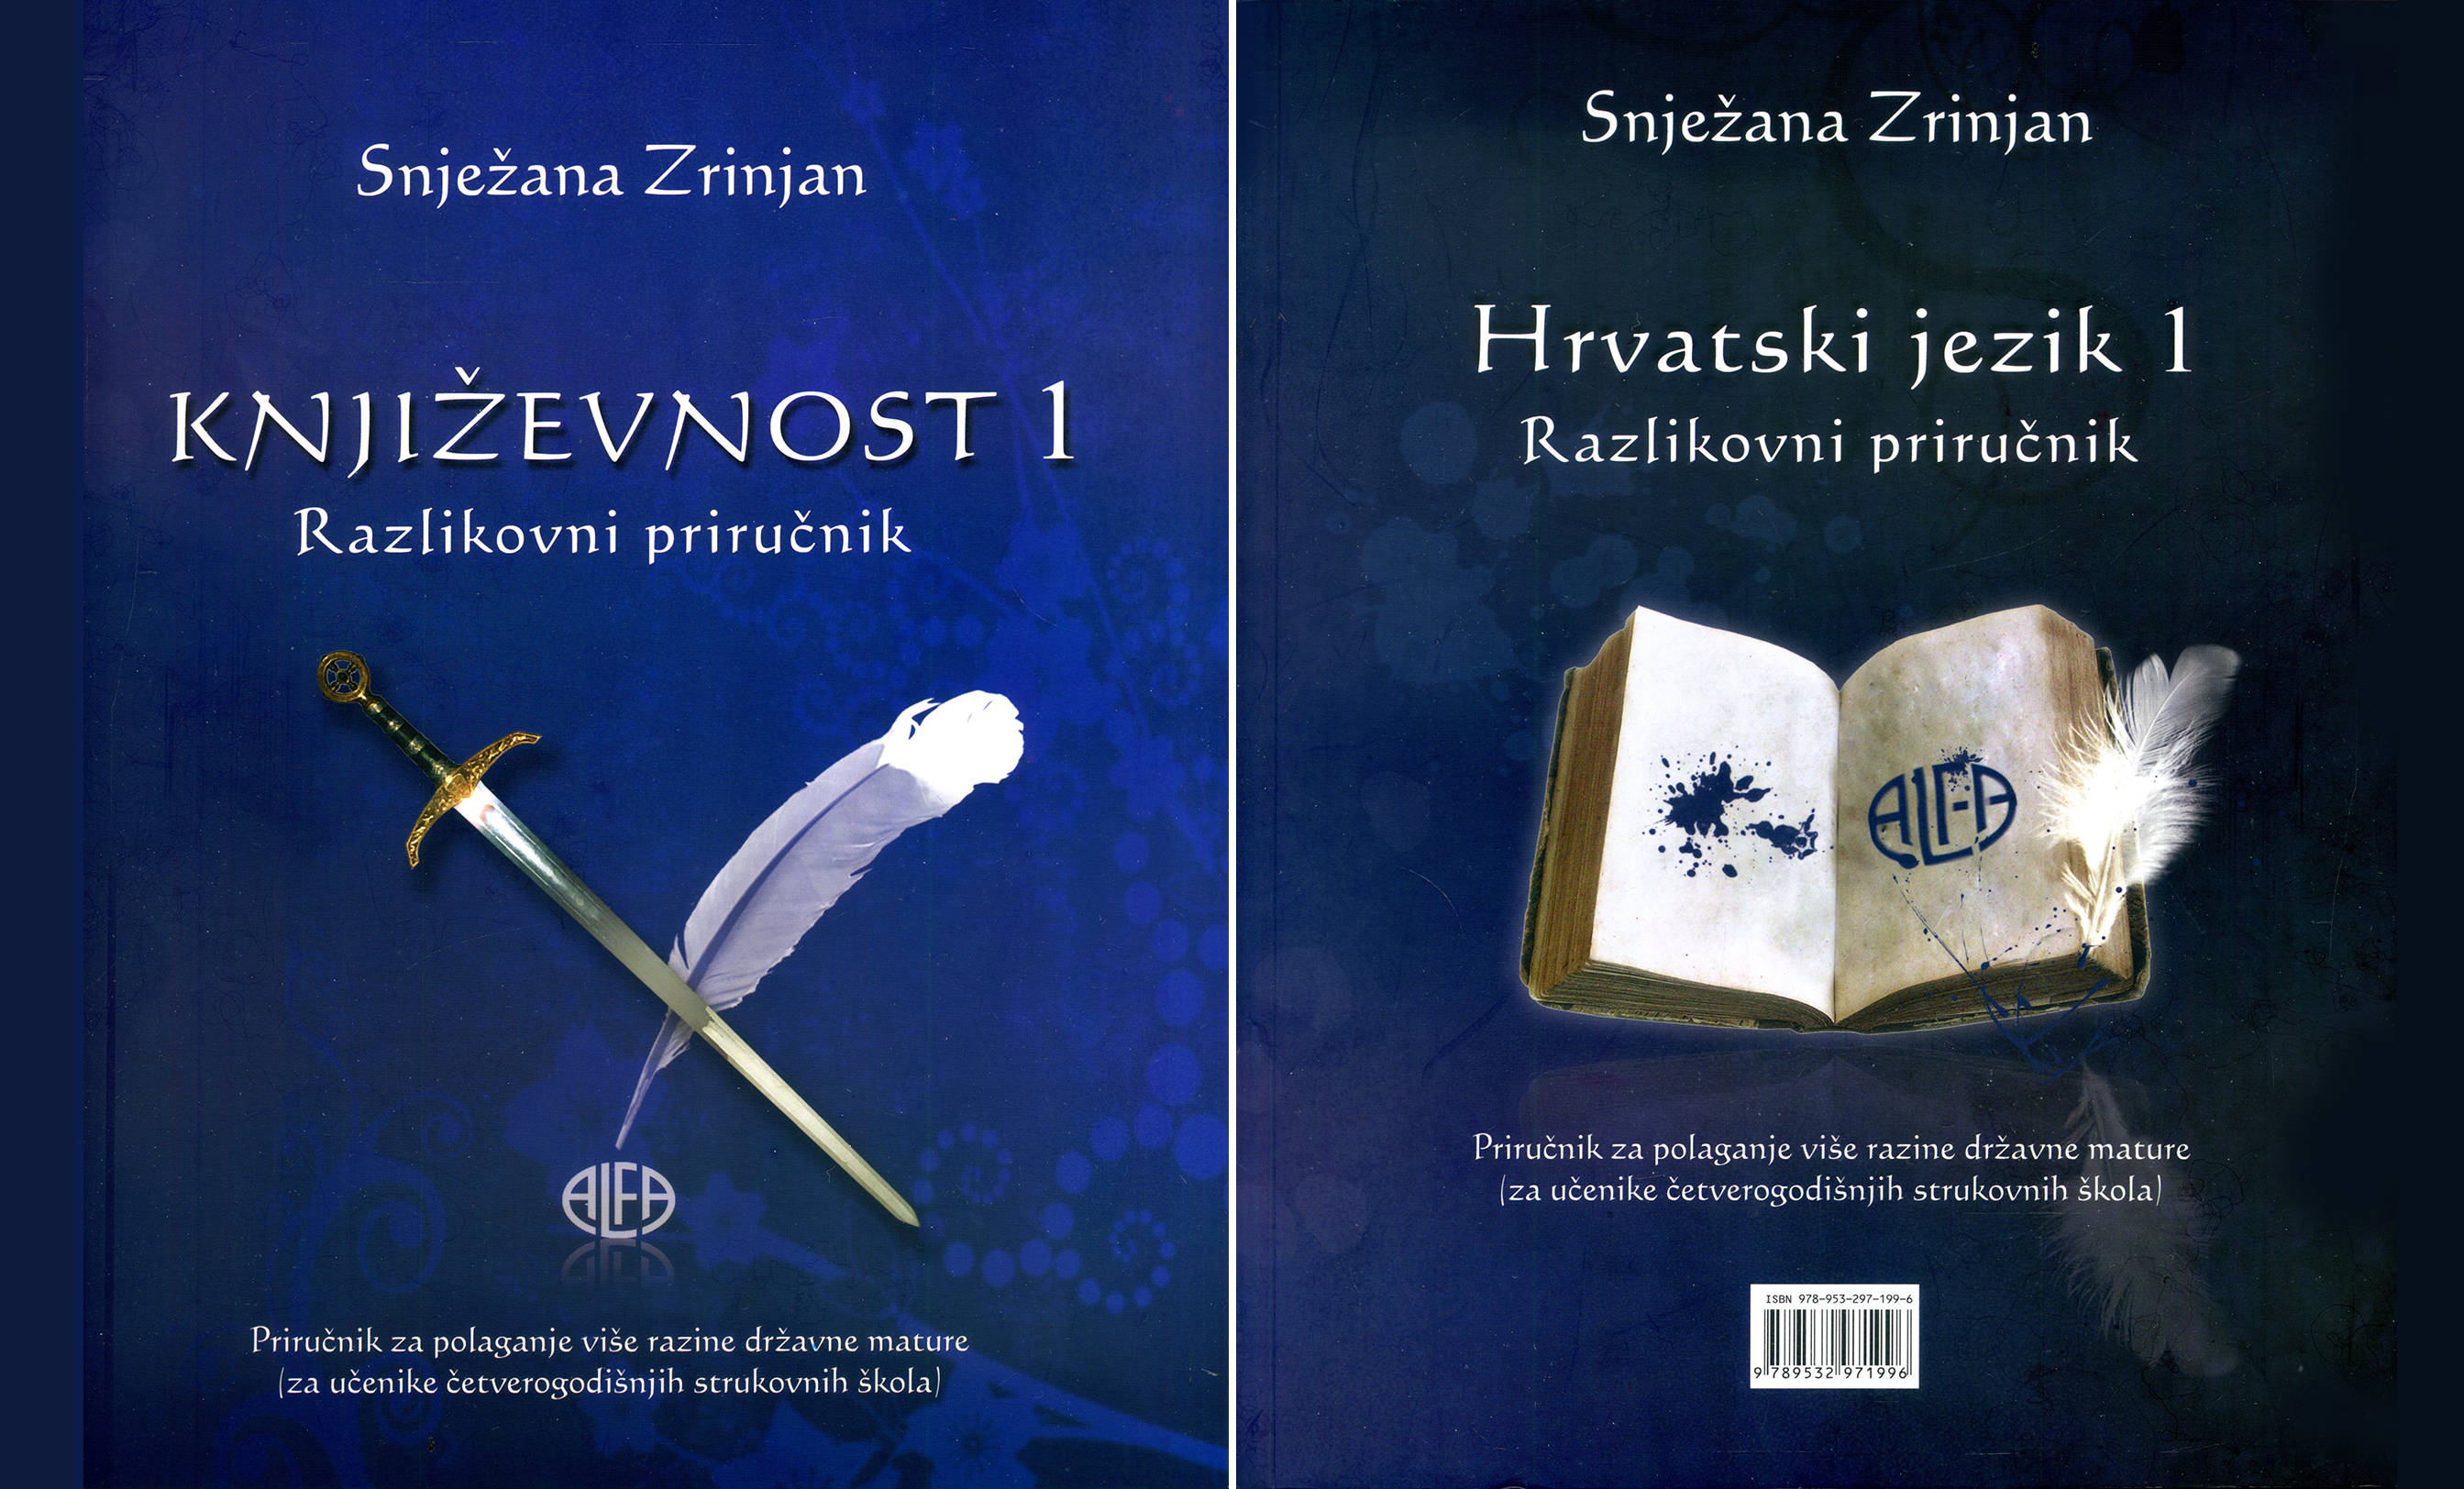 KNJIŽEVNOST 1 - RAZLIKOVNI PRIRUČNIK / HRVATSKI JEZIK 1 - RAZLIKOVNI PRIRUČNIK